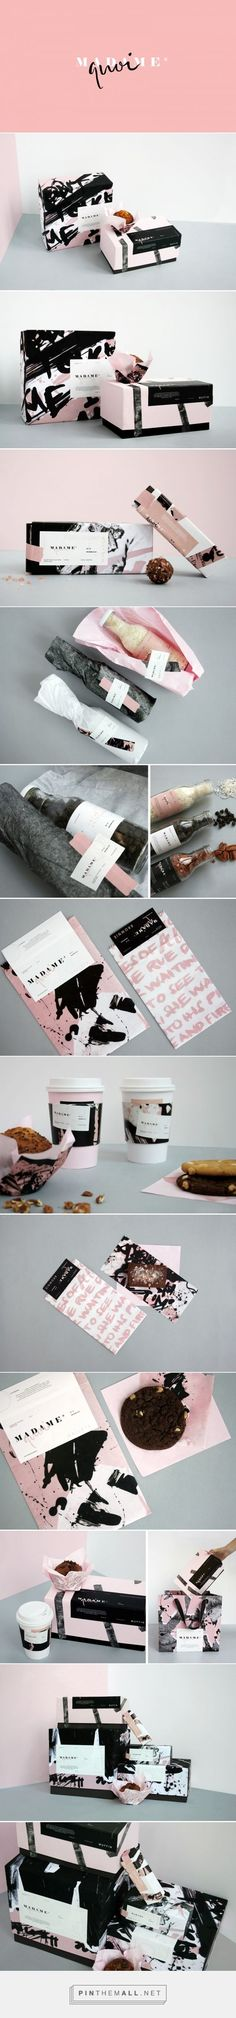 Food beverage packaging | branding | food branding | blush | pink | black | design | graphic design